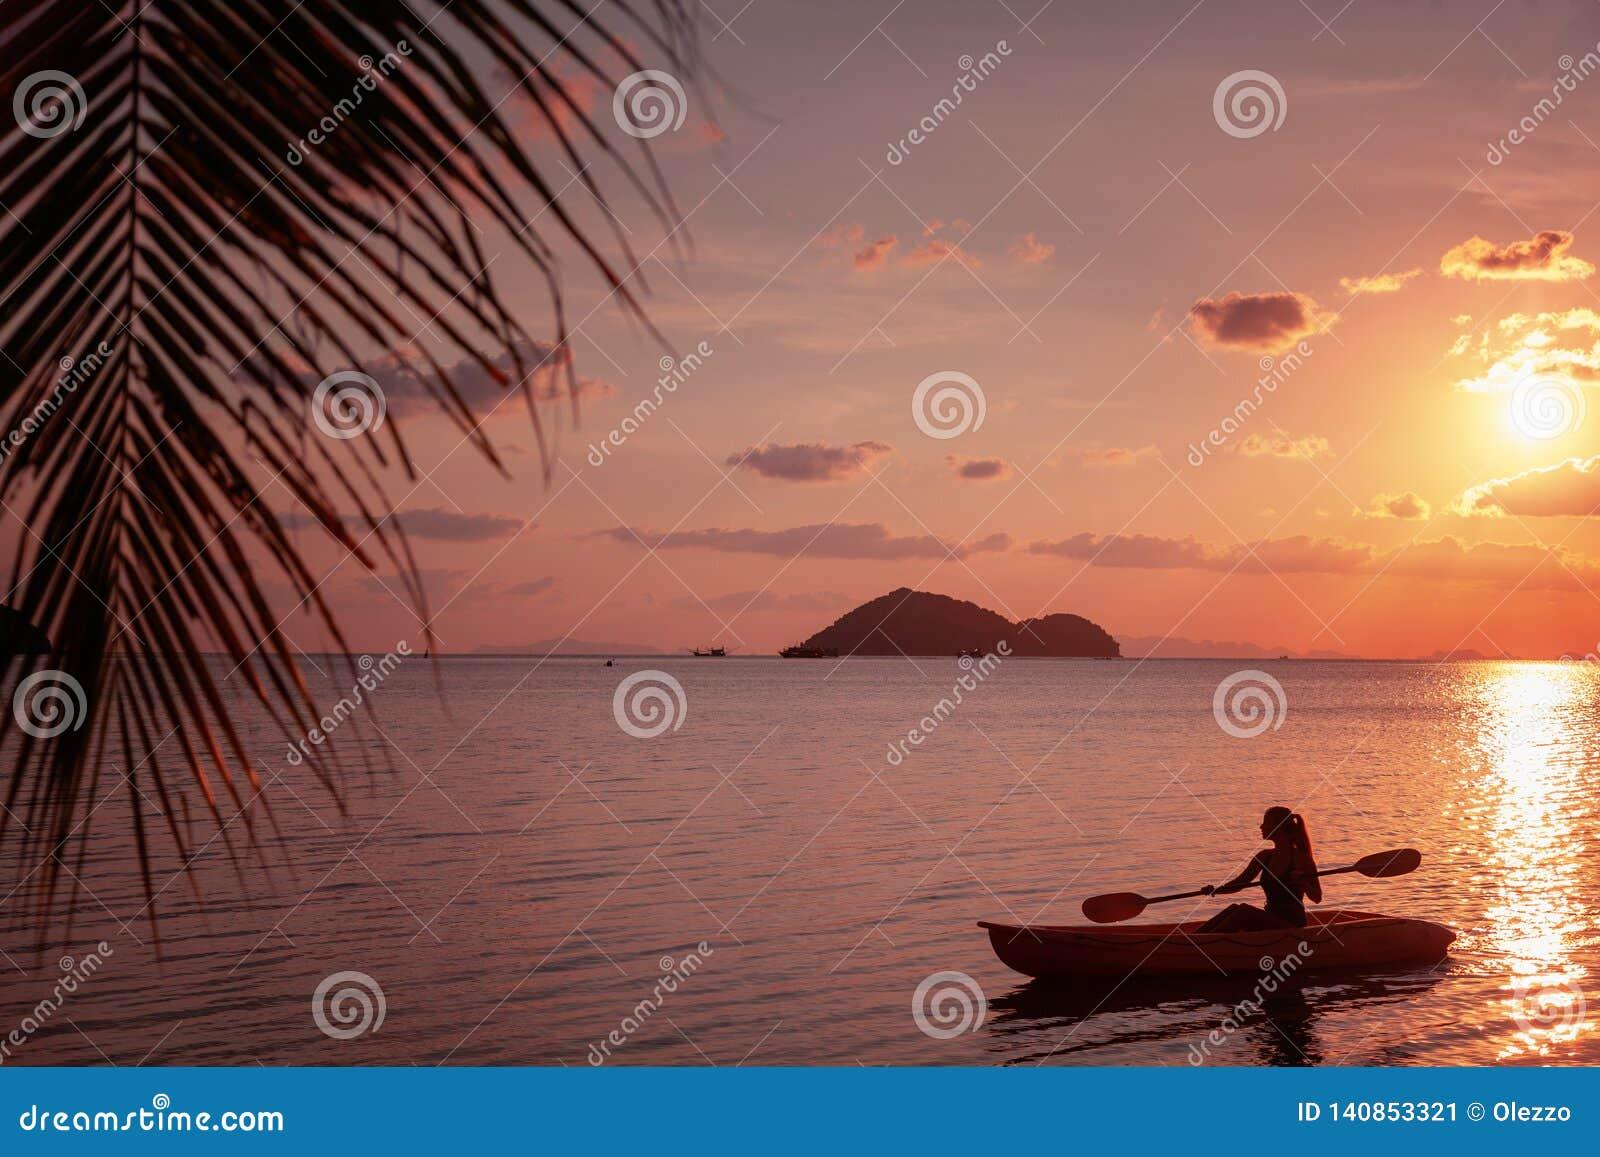 Girl On Kayak Sea At Sunset, Healthy Lifestyle Design  Sport